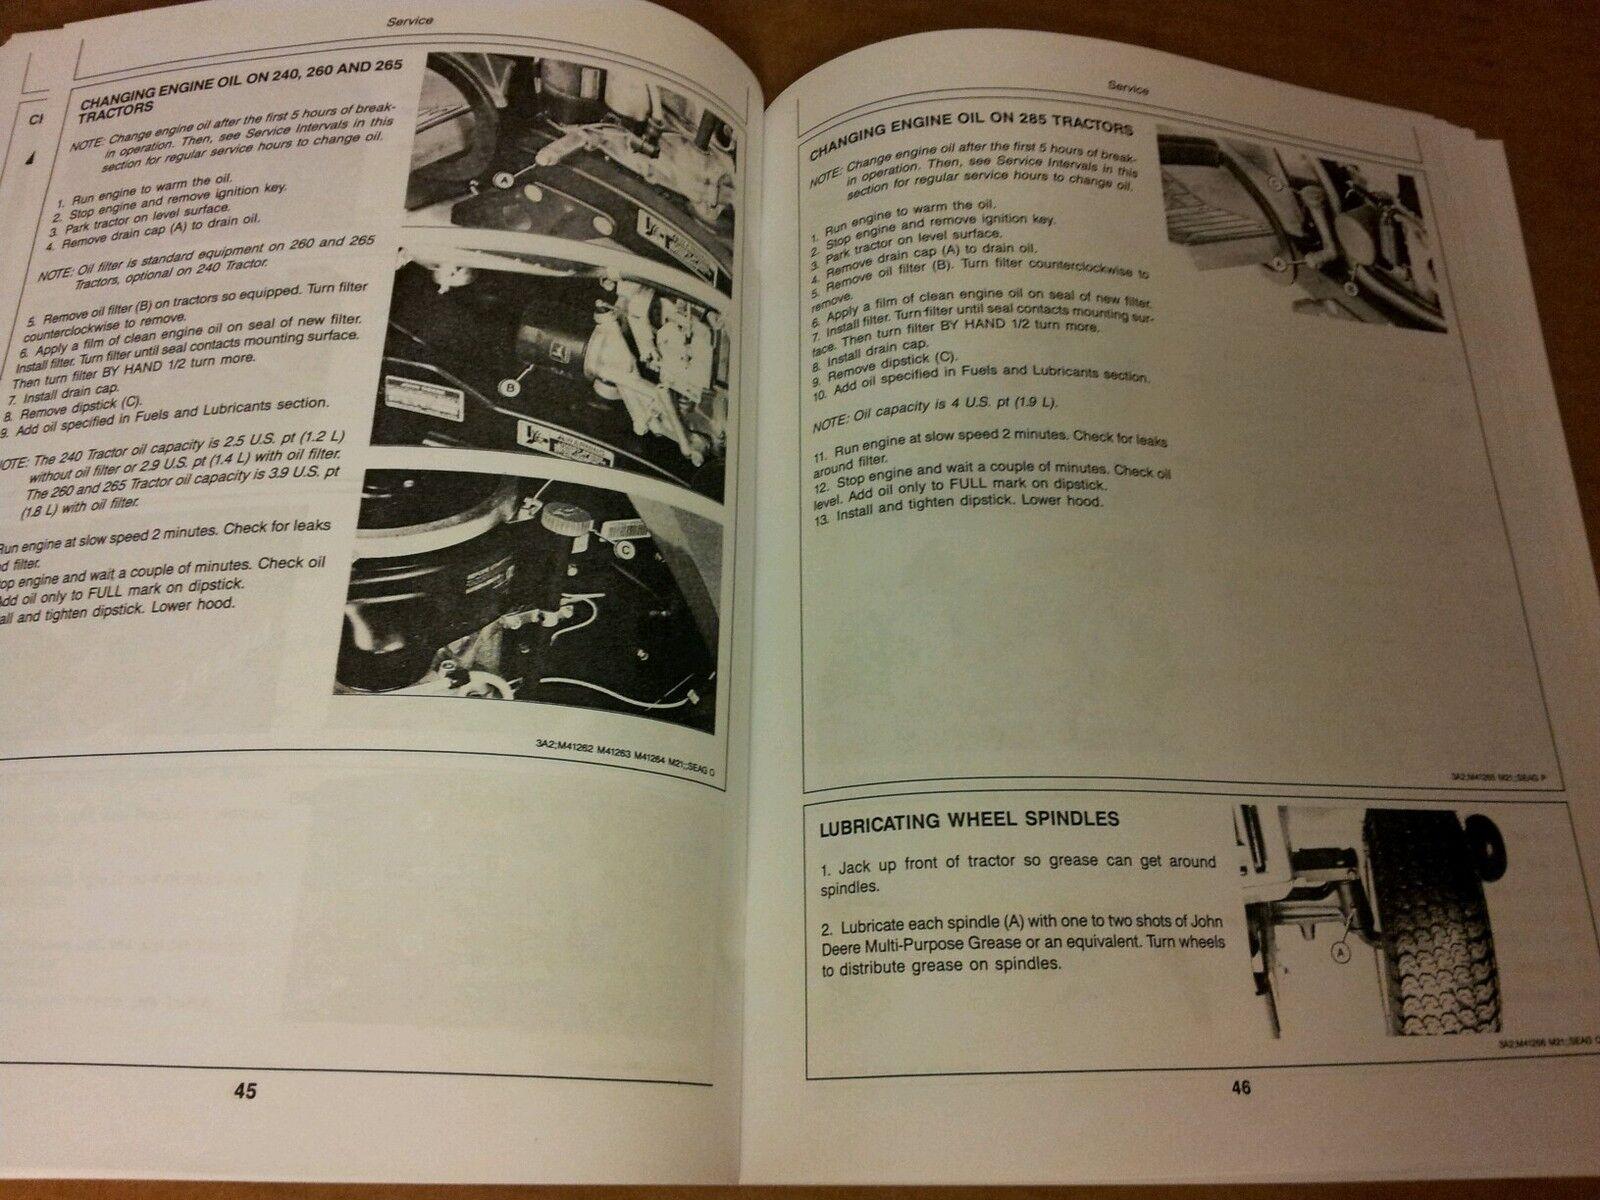 hight resolution of john deere 240 260 265 285 lawn garden tractors ops manual omm71197 issue h7 for sale online ebay